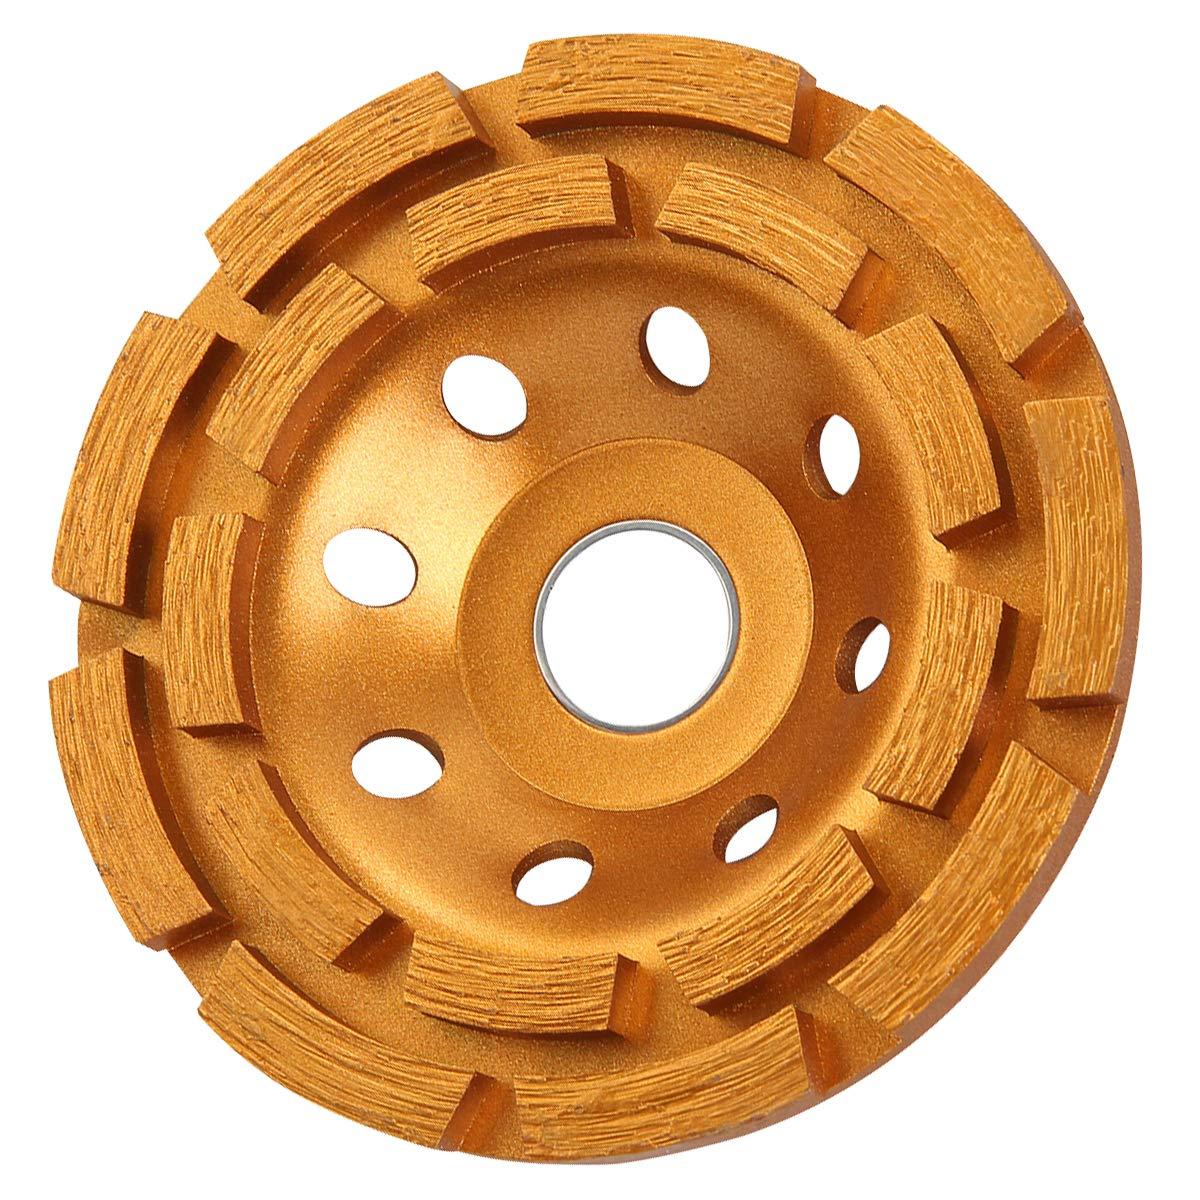 KSEIBI 644030 4-1/2-Inch Double Row Diamond Cup Grinding Wheel Gold by KSEIBI